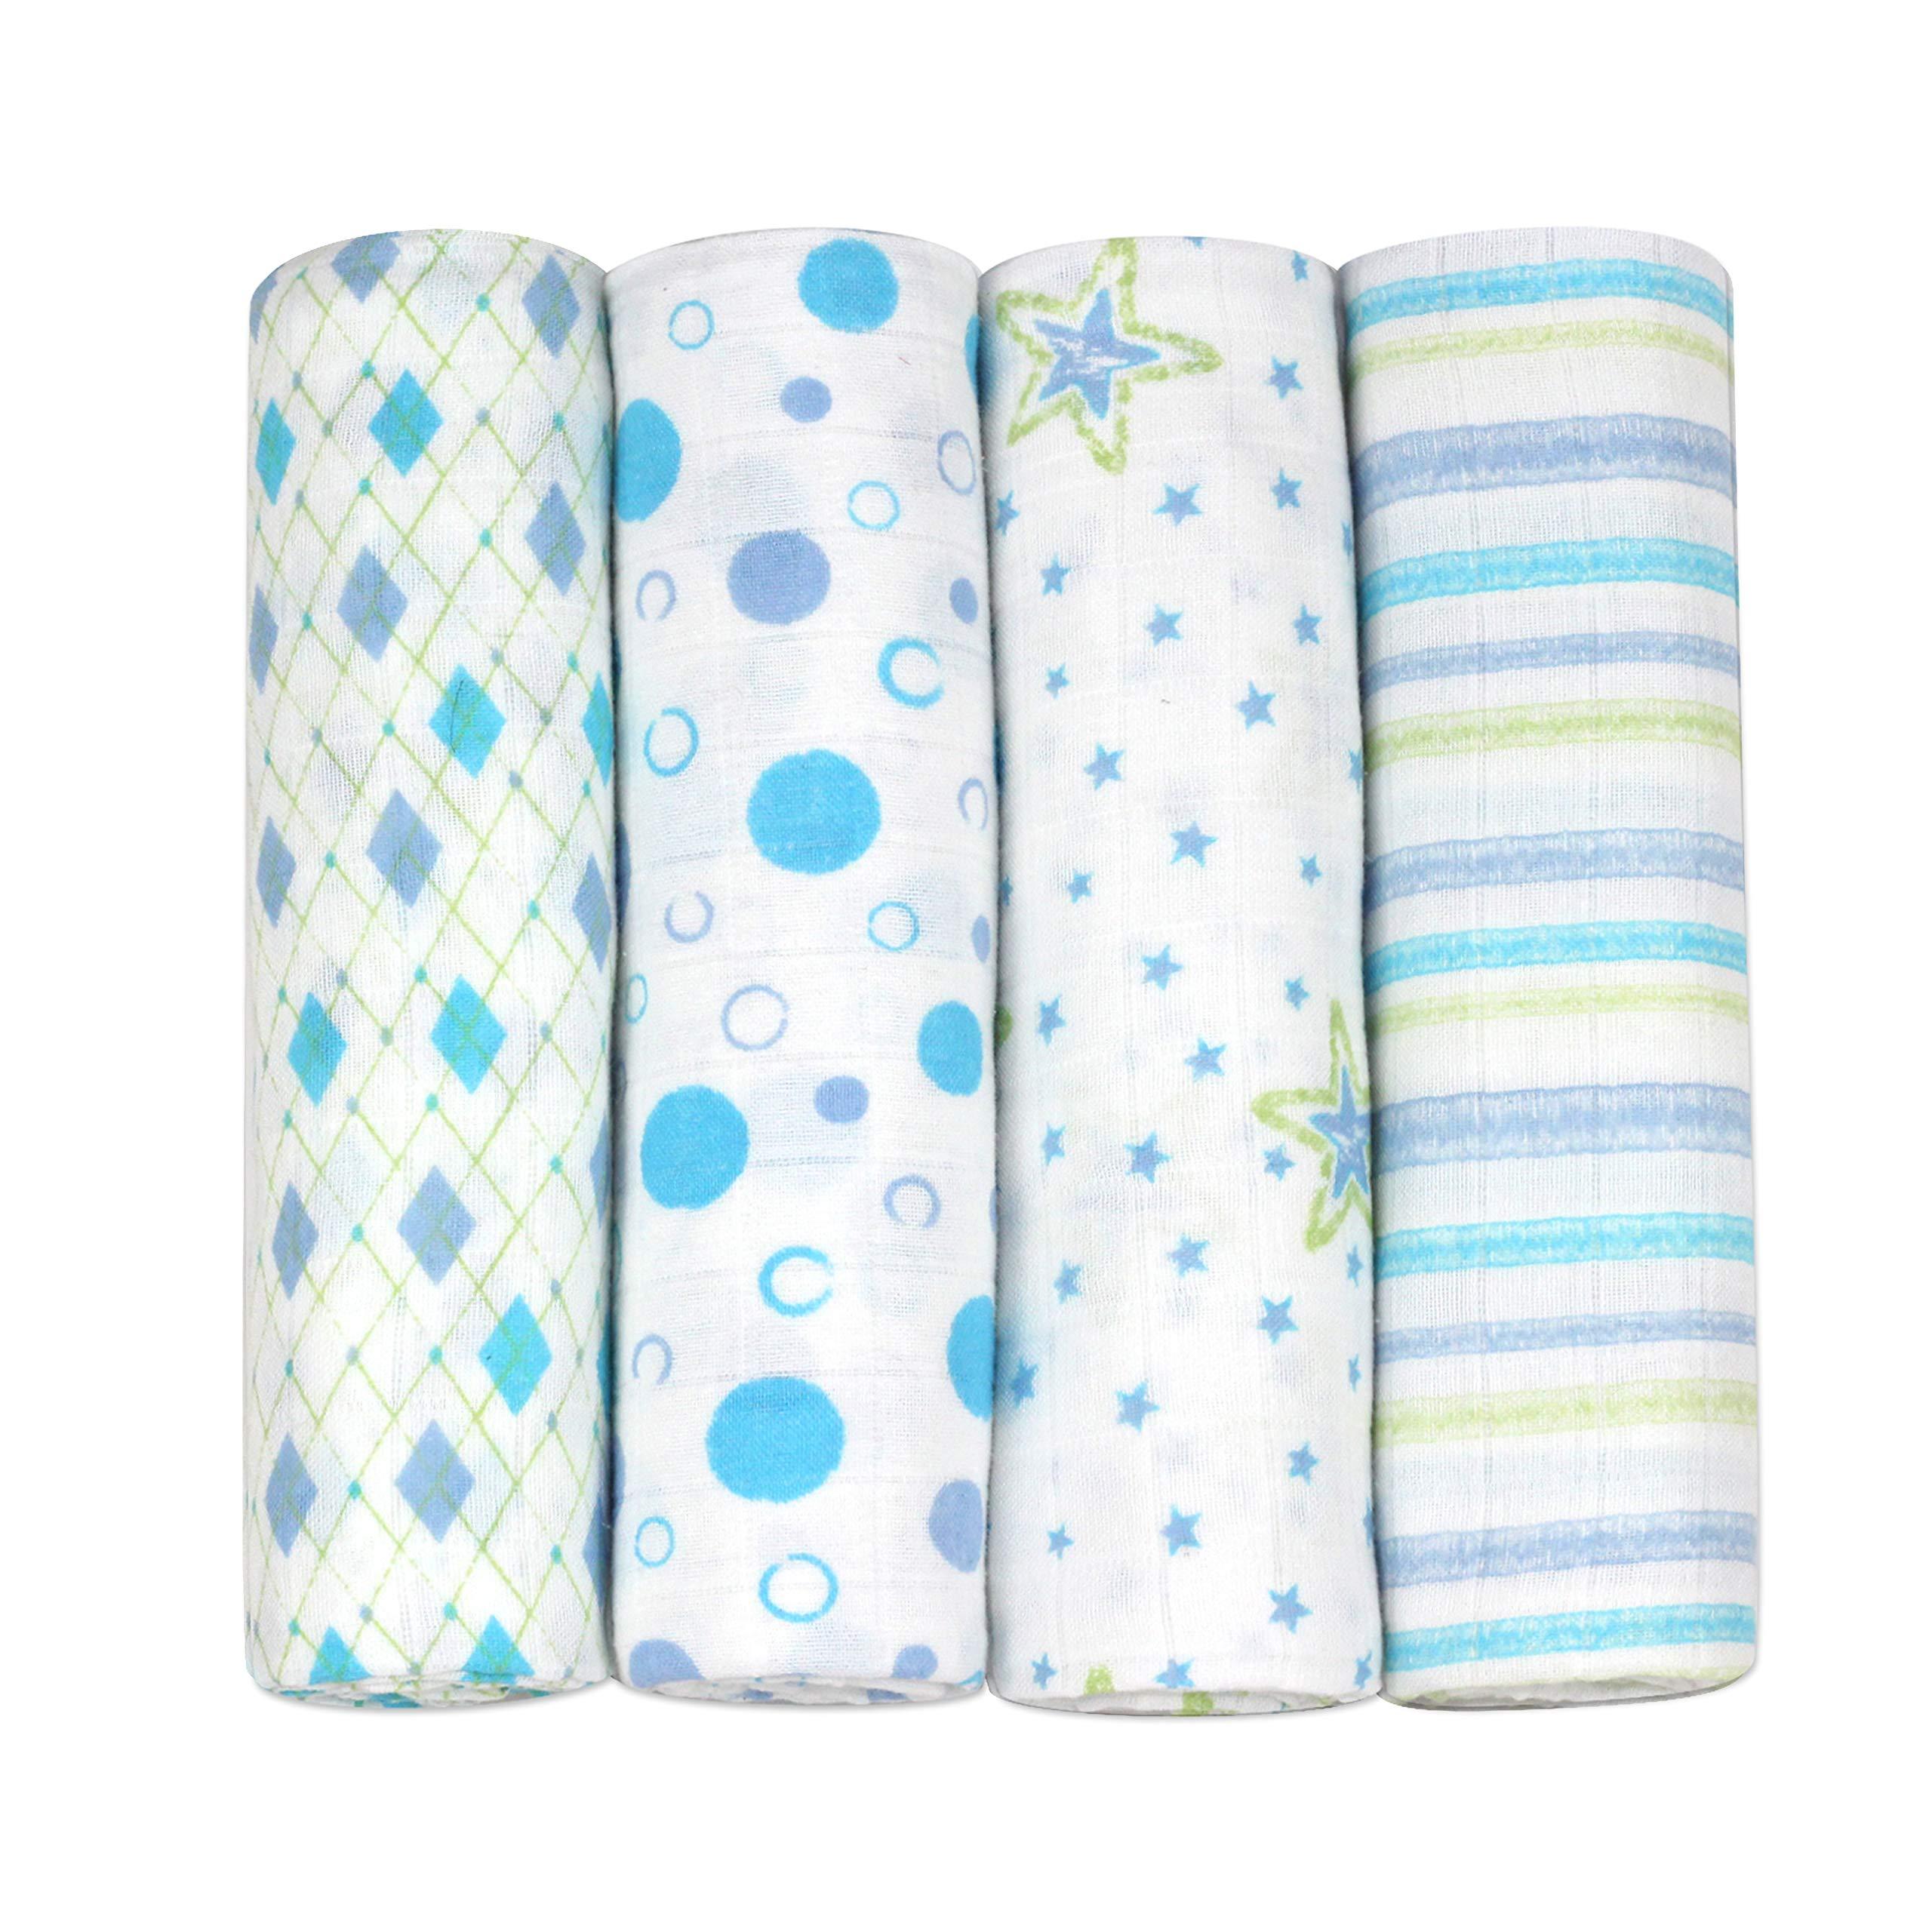 "j & Alex's""Little Gentleman"" 100% Cotton Muslin Baby Swaddle Blankets, 4 Count, 47 x 47 inch"